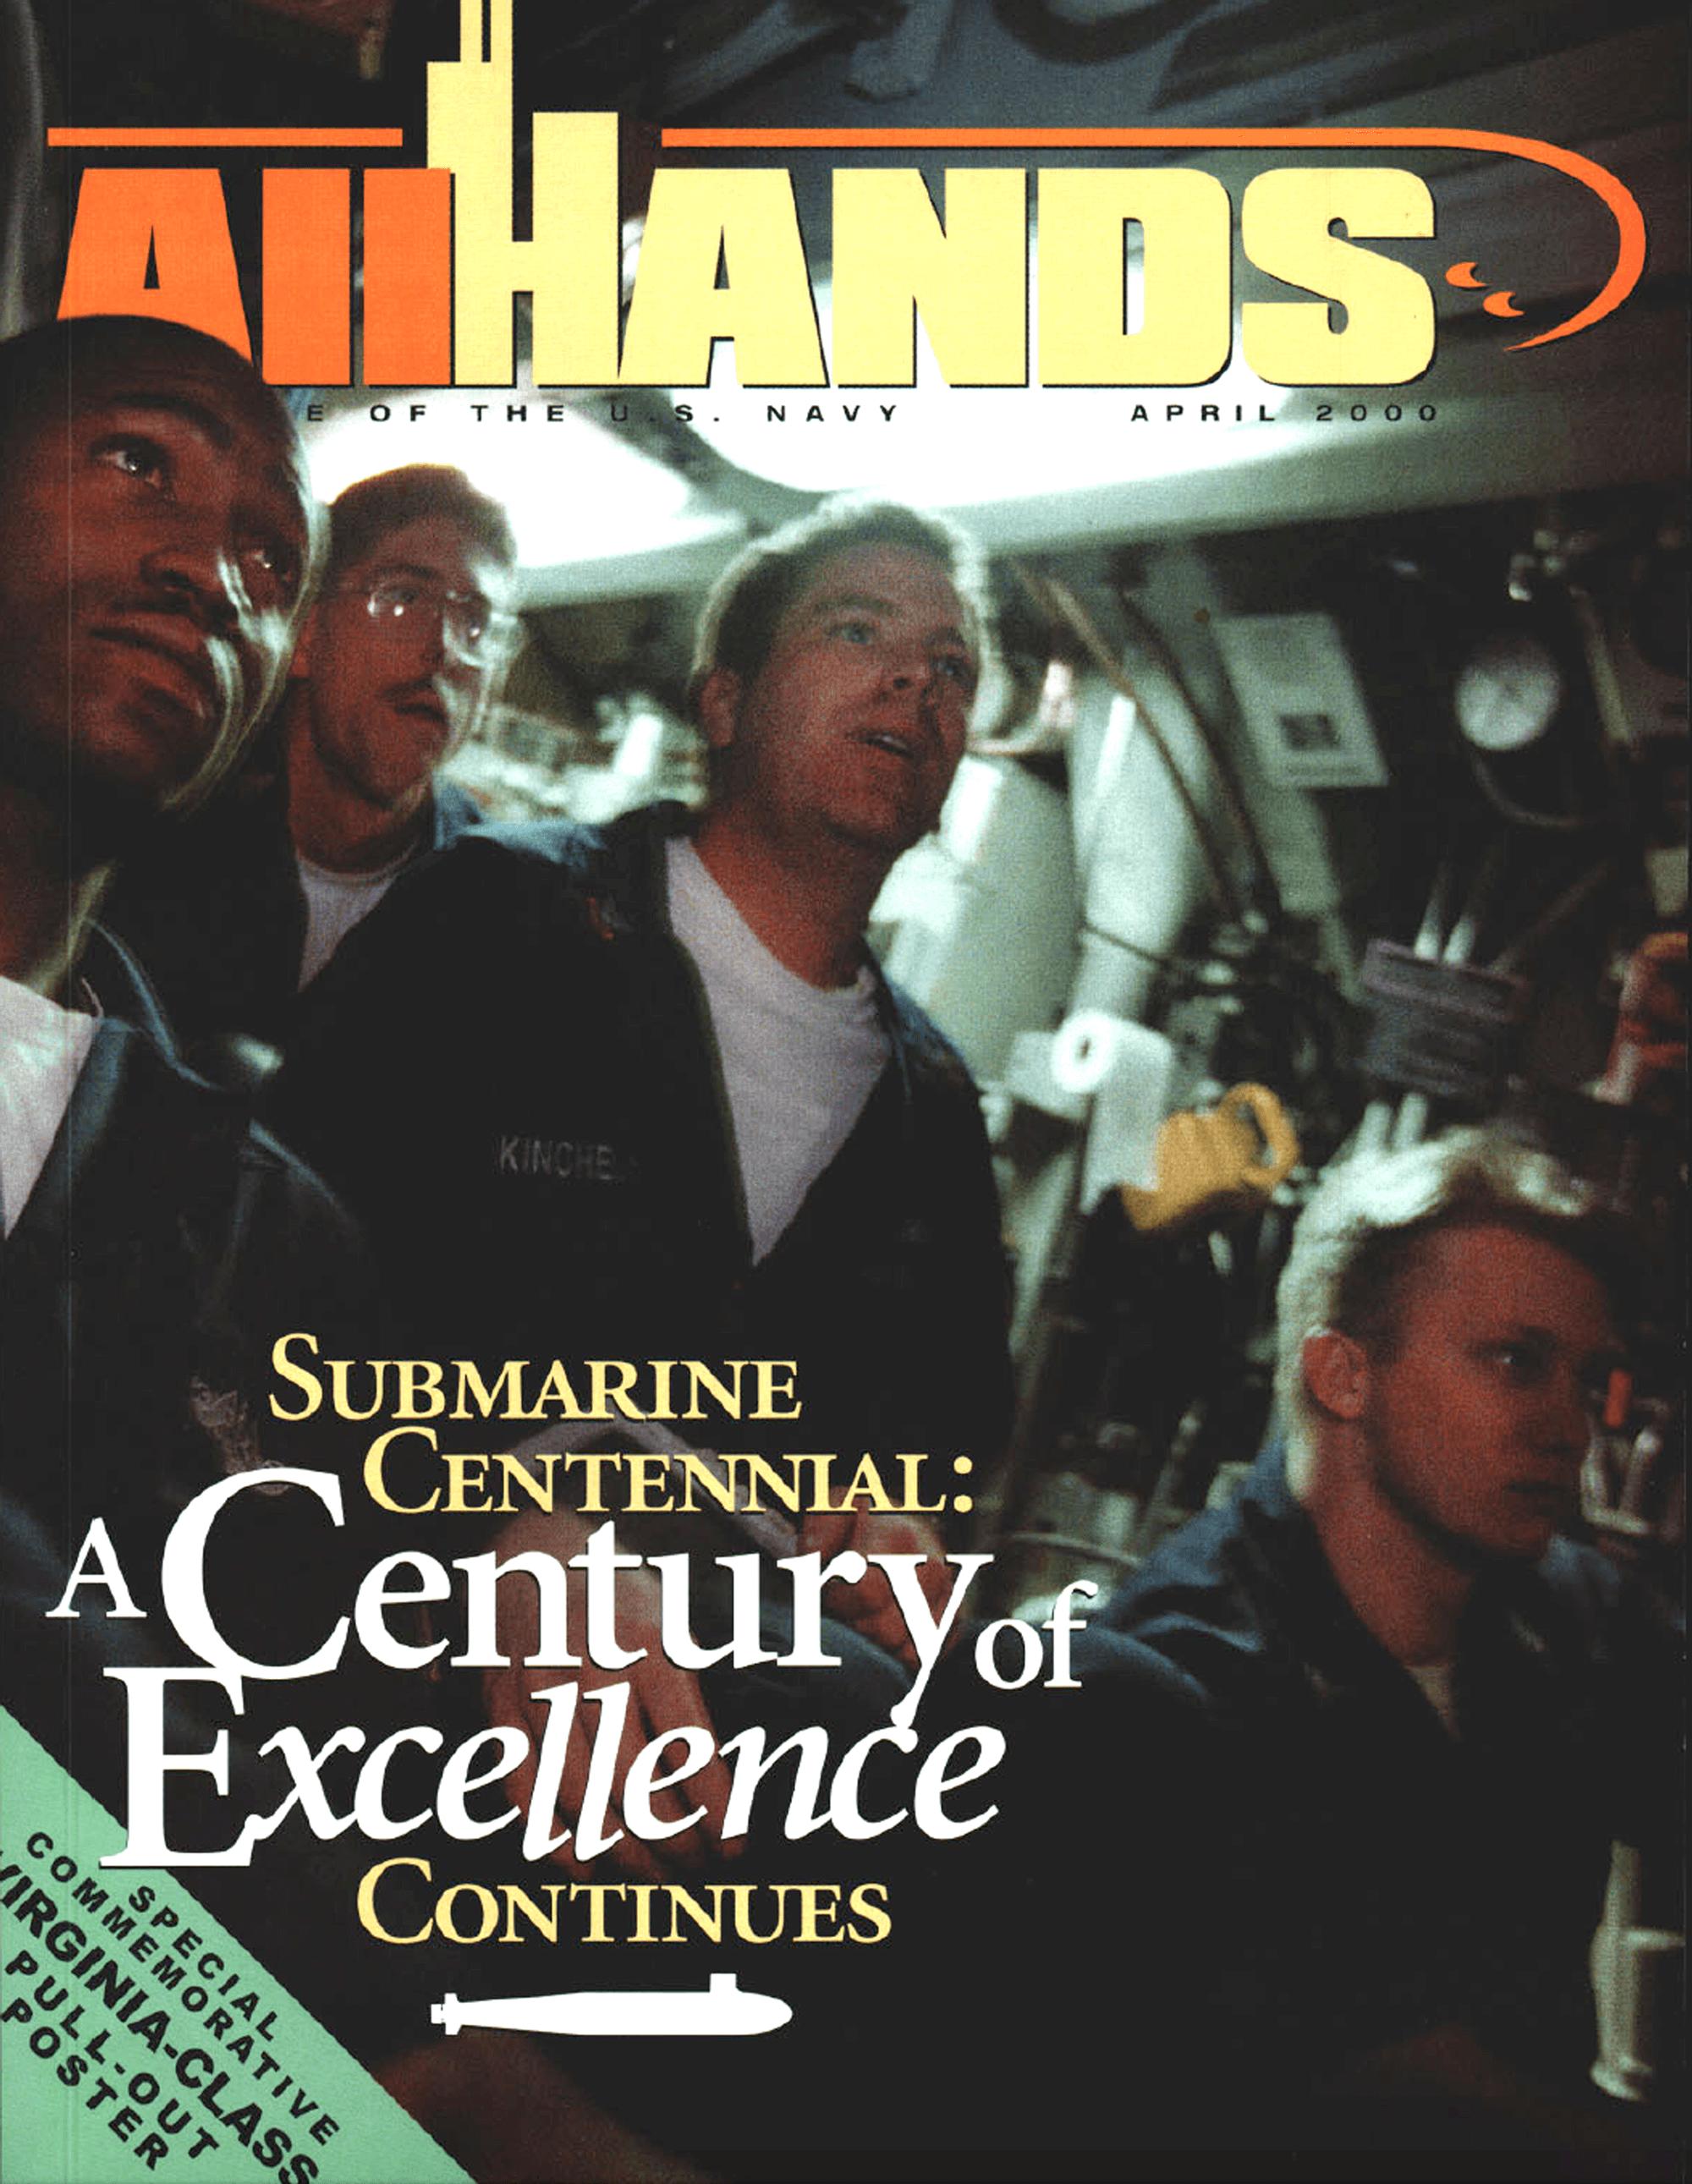 The U.S. Navy' All Hands magazine